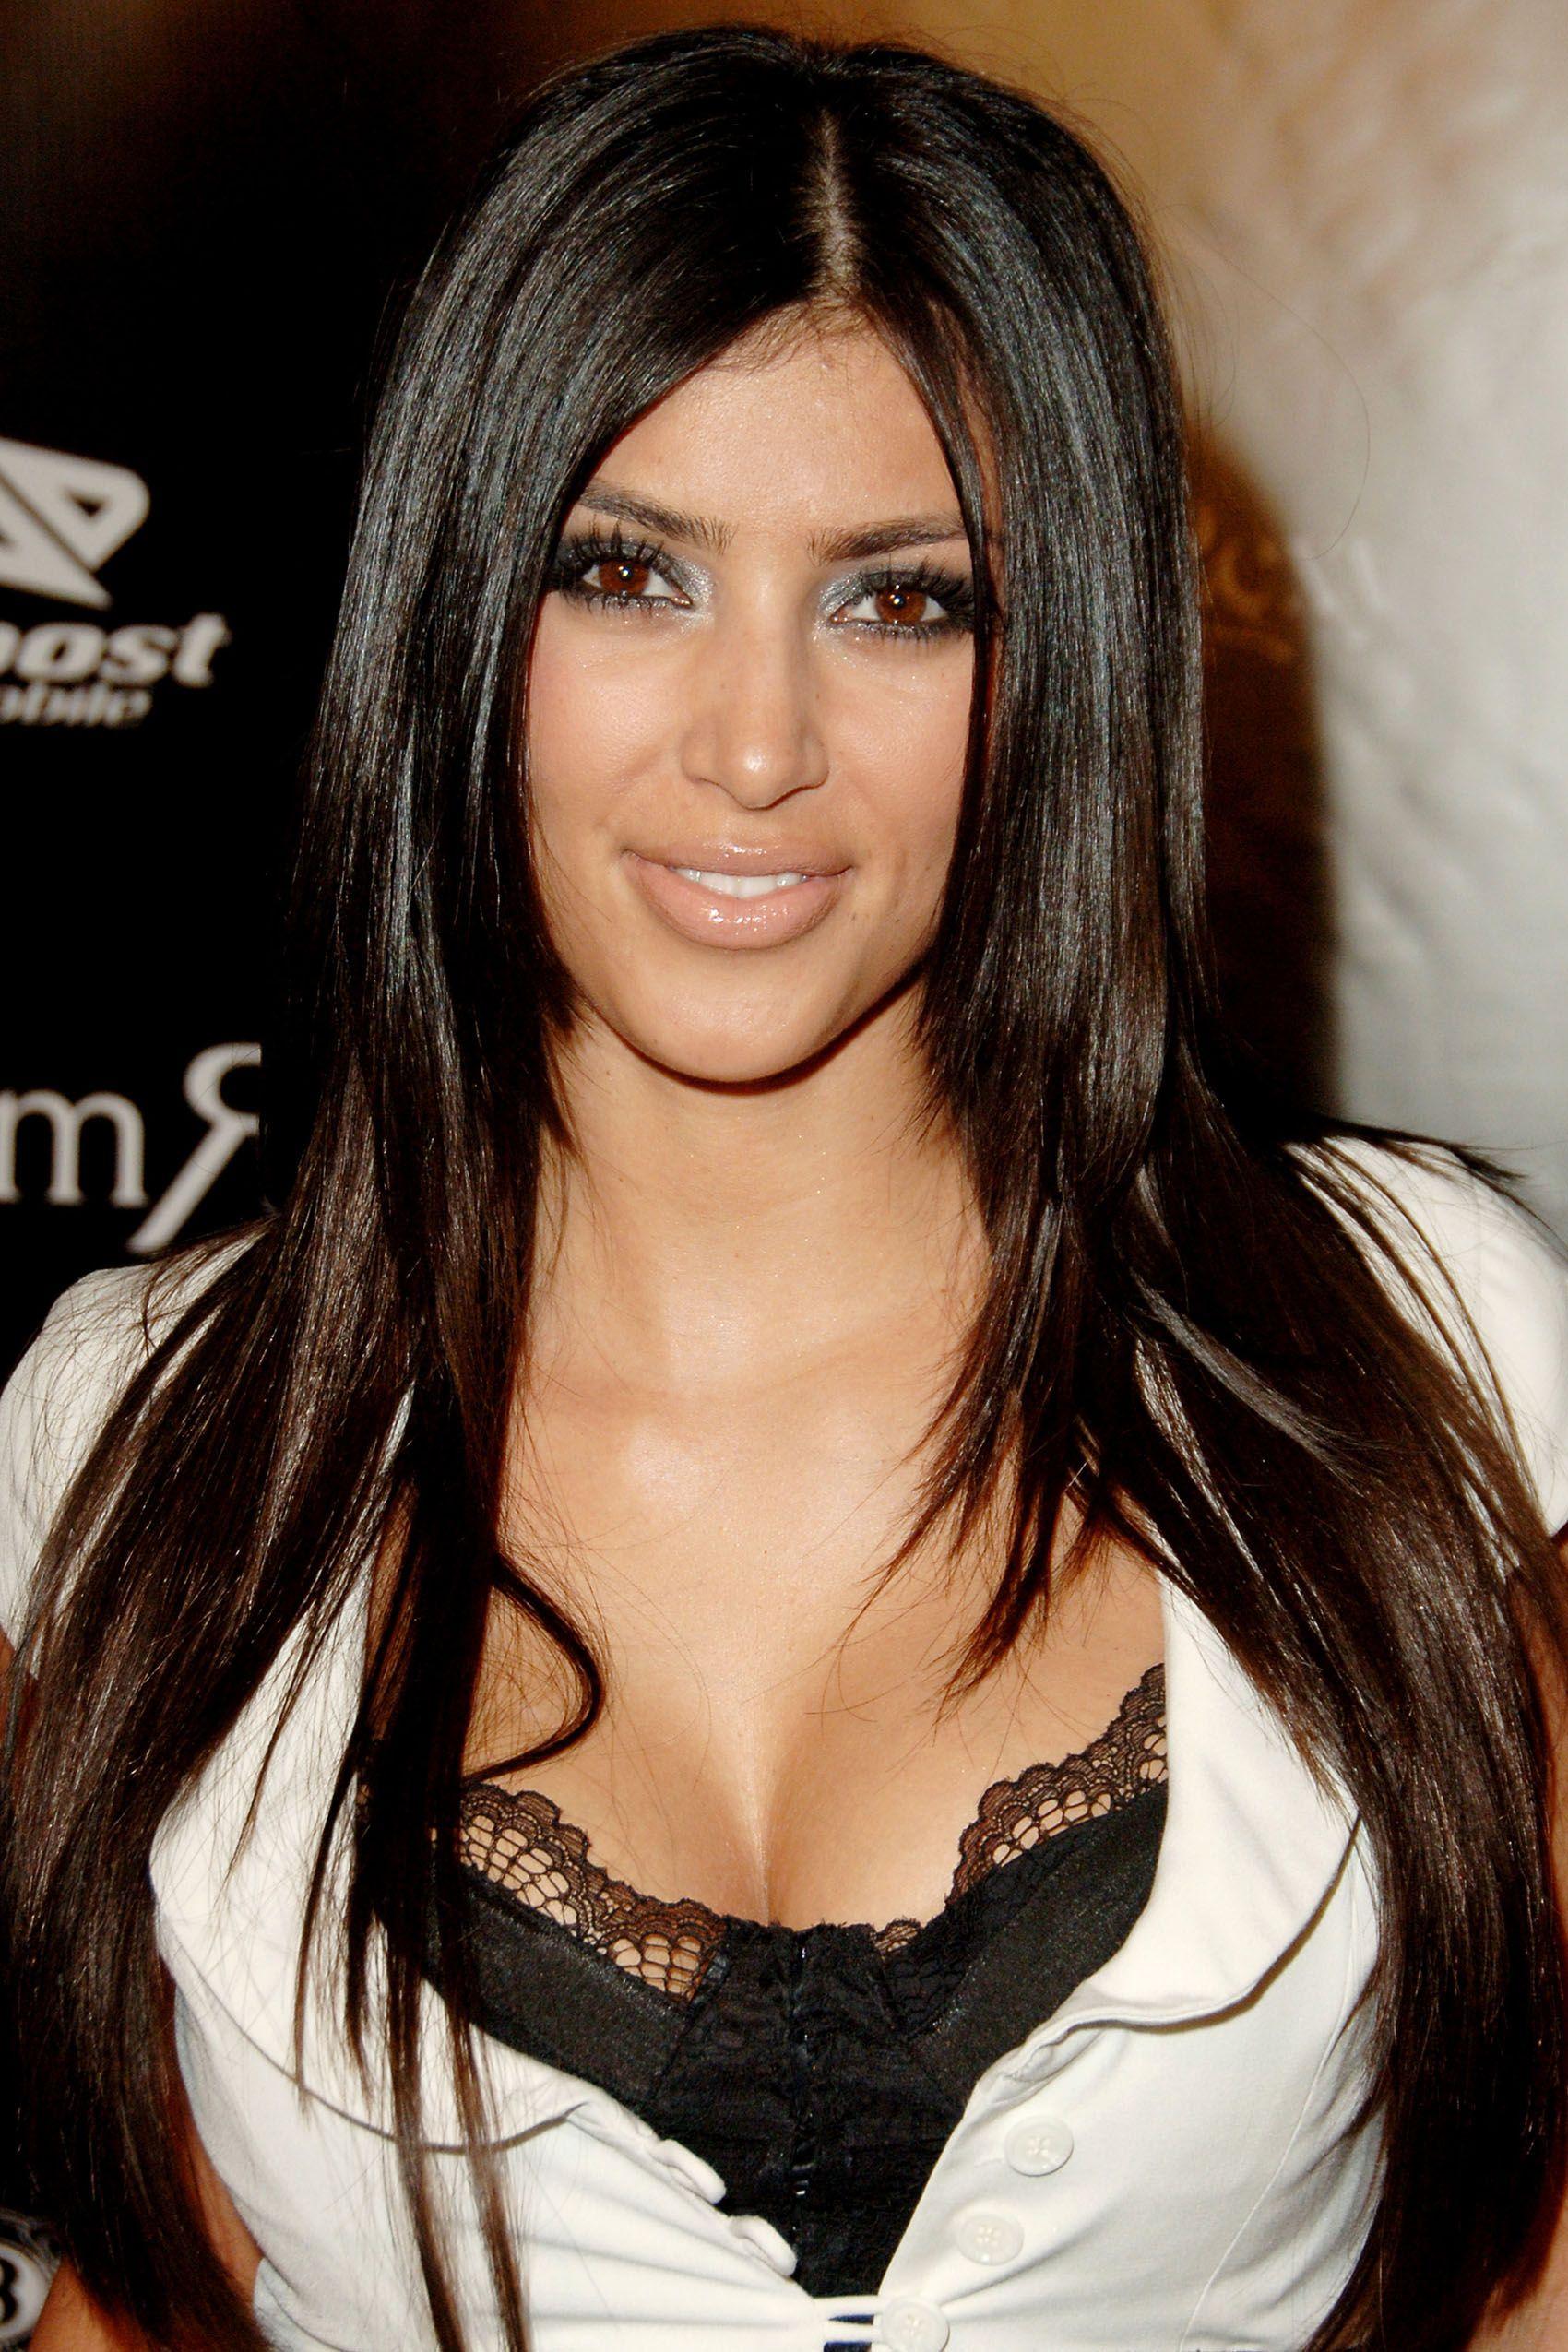 kim kardashian's makeup and hairstyles